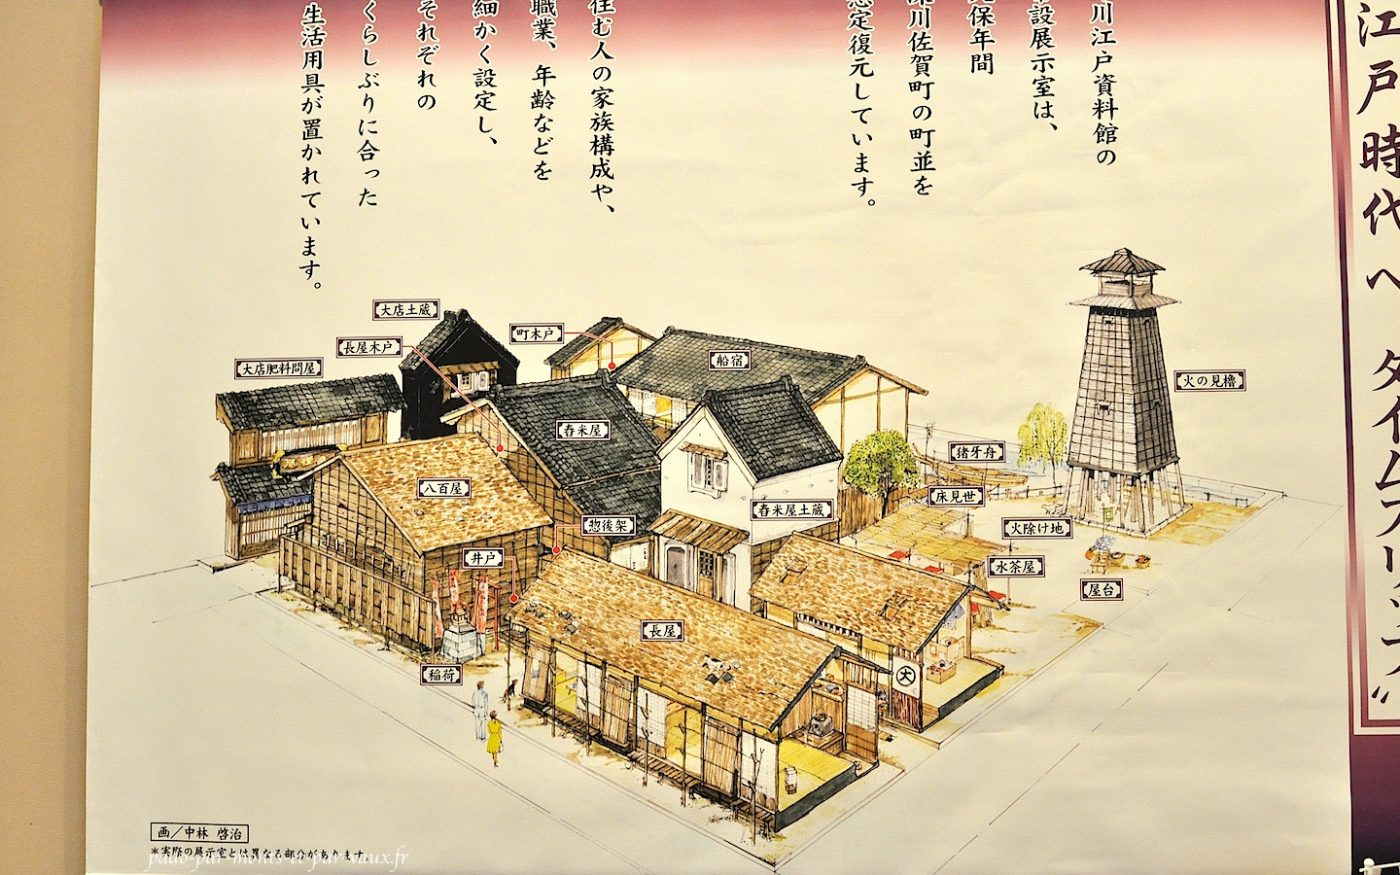 Fukagawa Edo museum reconstitution